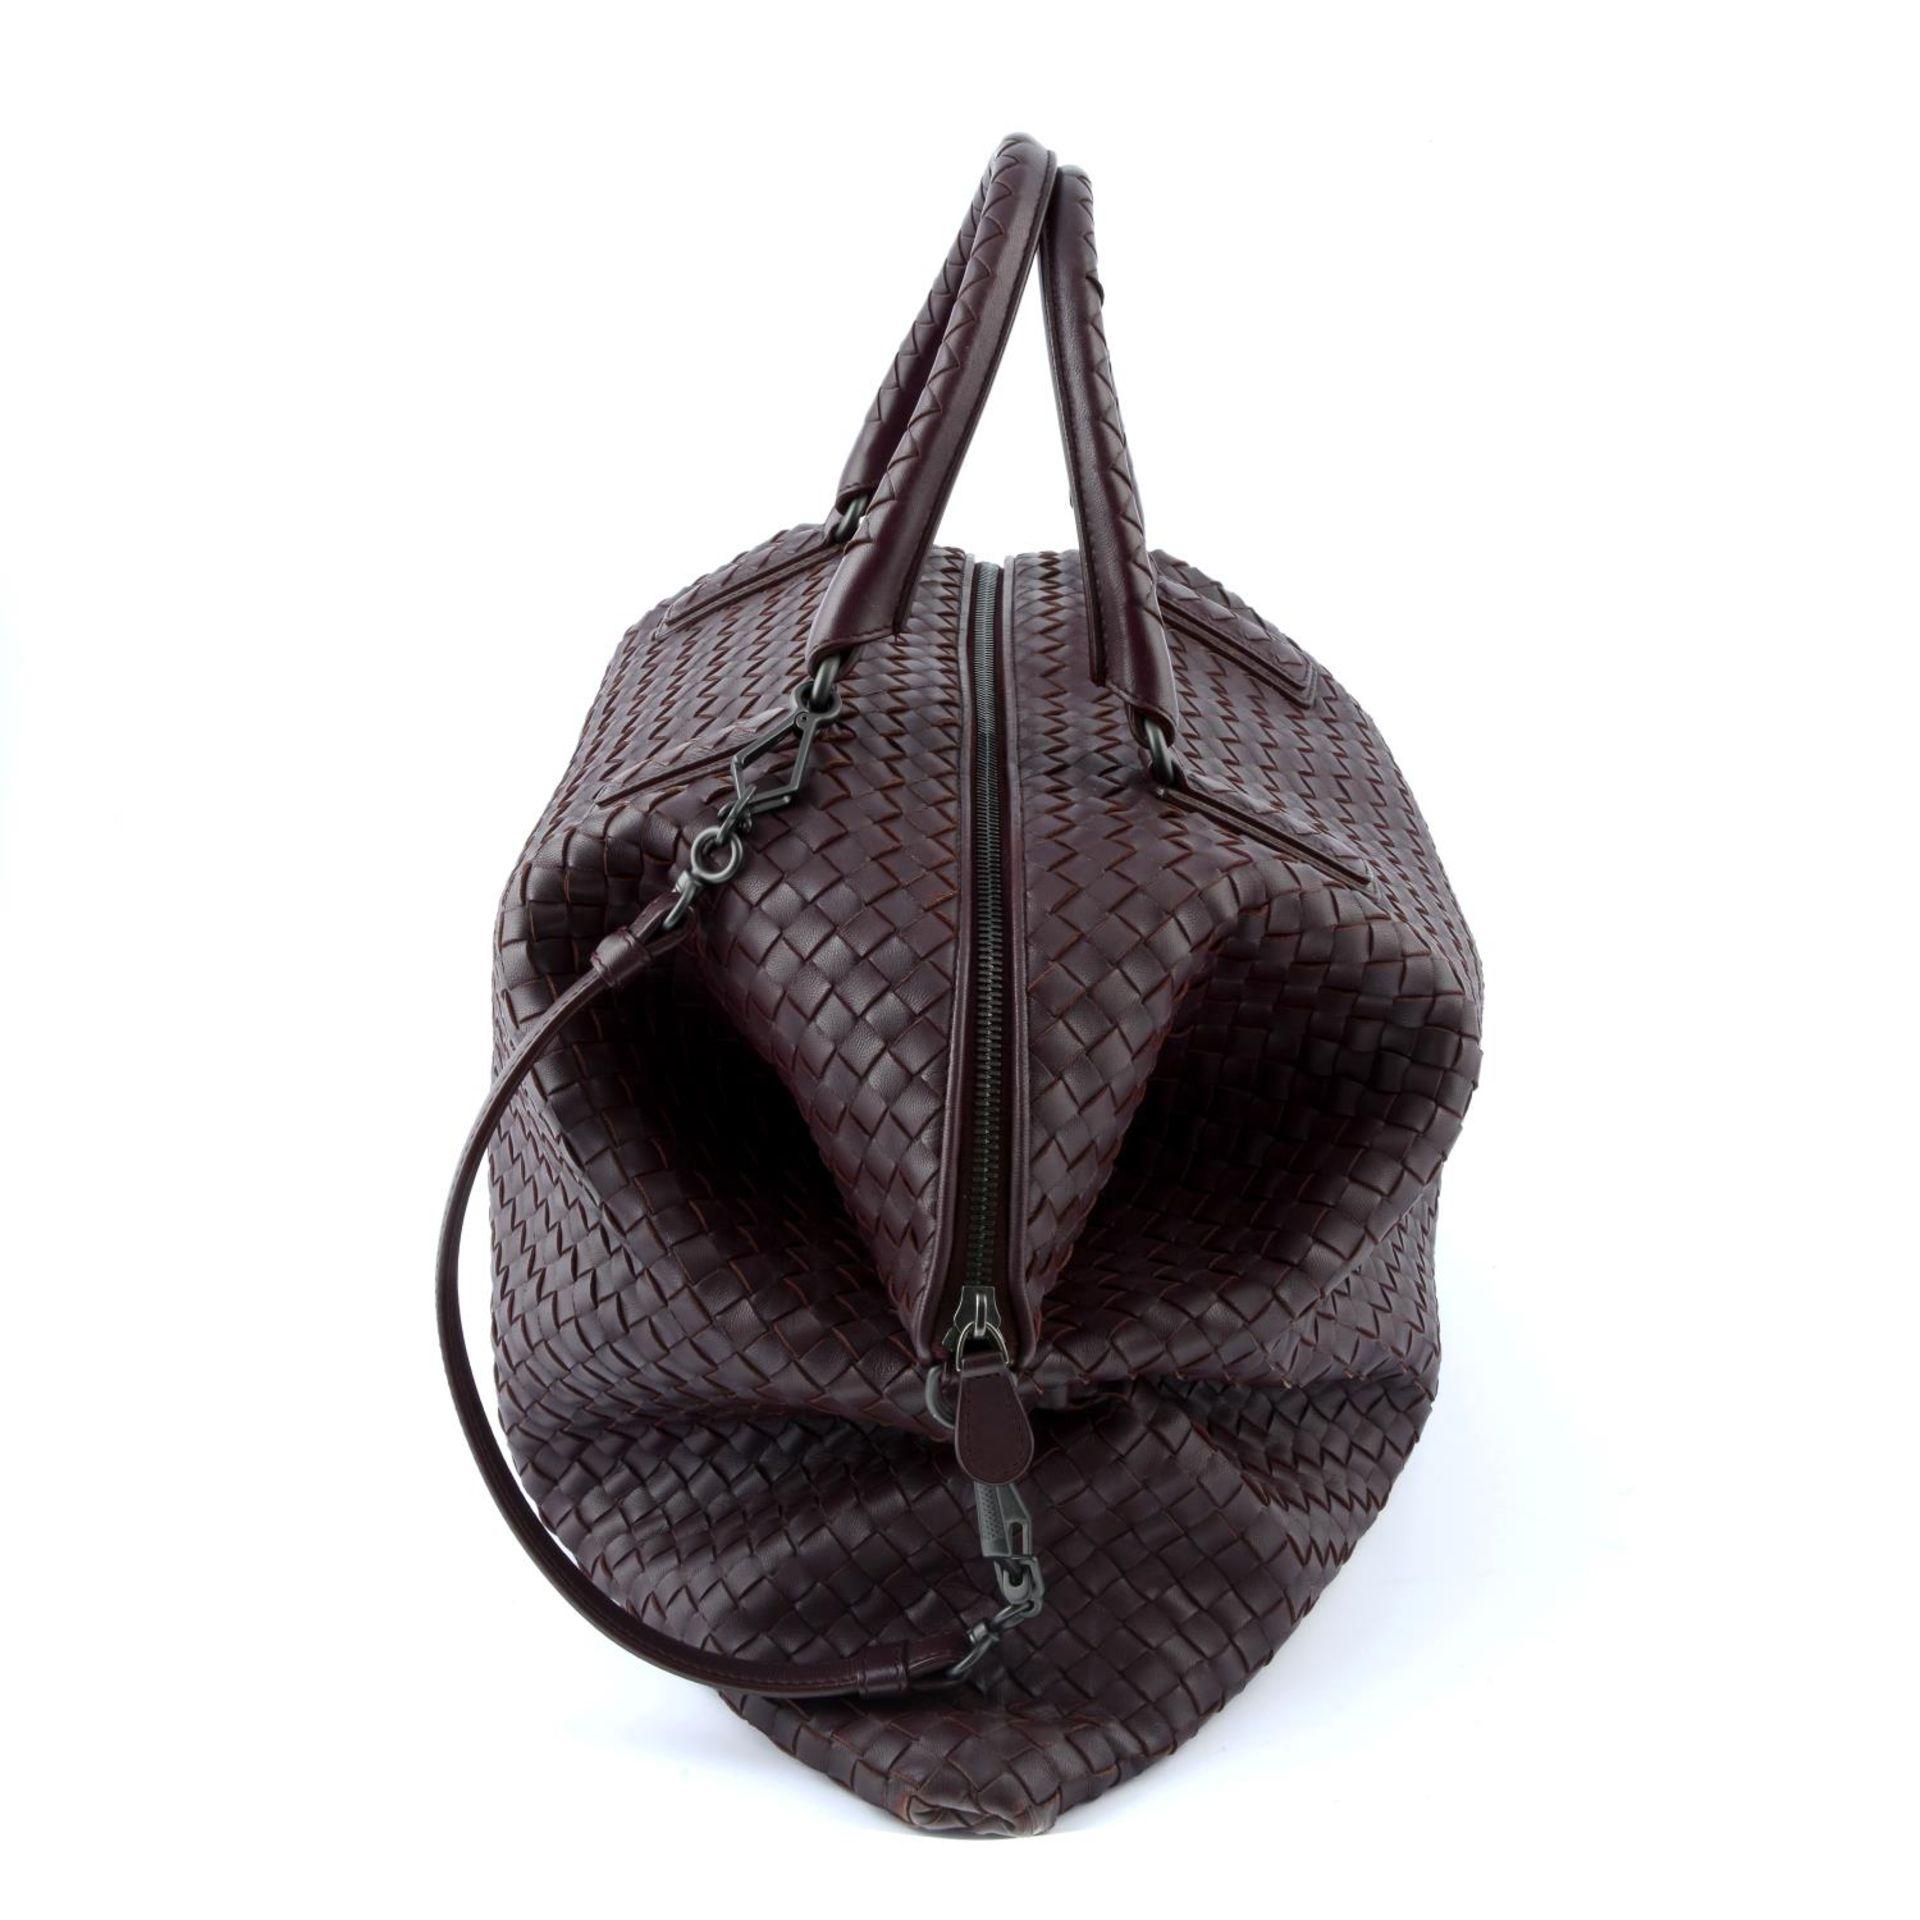 BOTTEGA VENETA - an XL fold over Nappa Intrecciato handbag. - Image 3 of 5